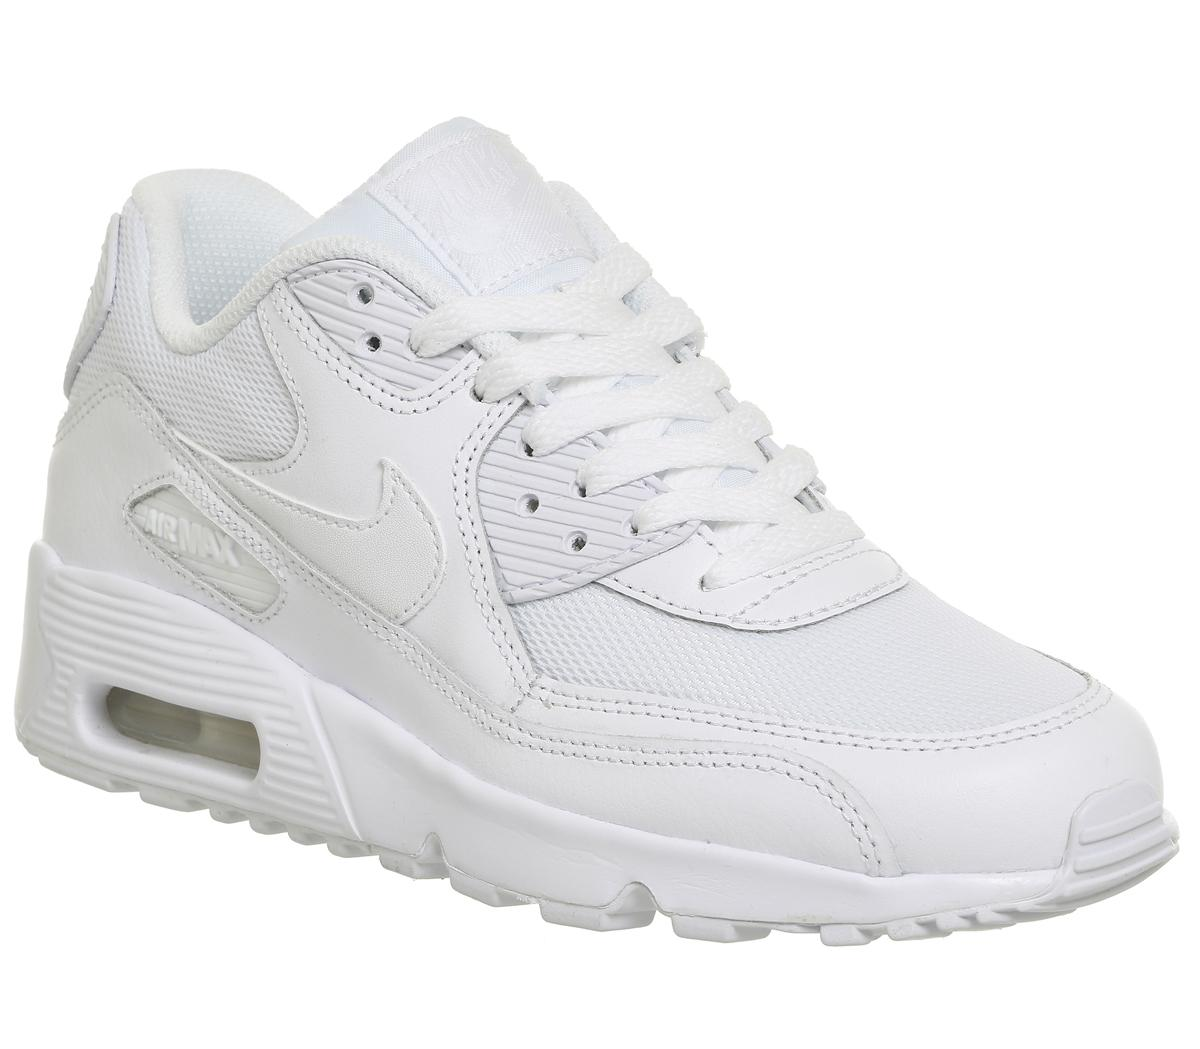 Nike Air Max 90 Trainers White Mono